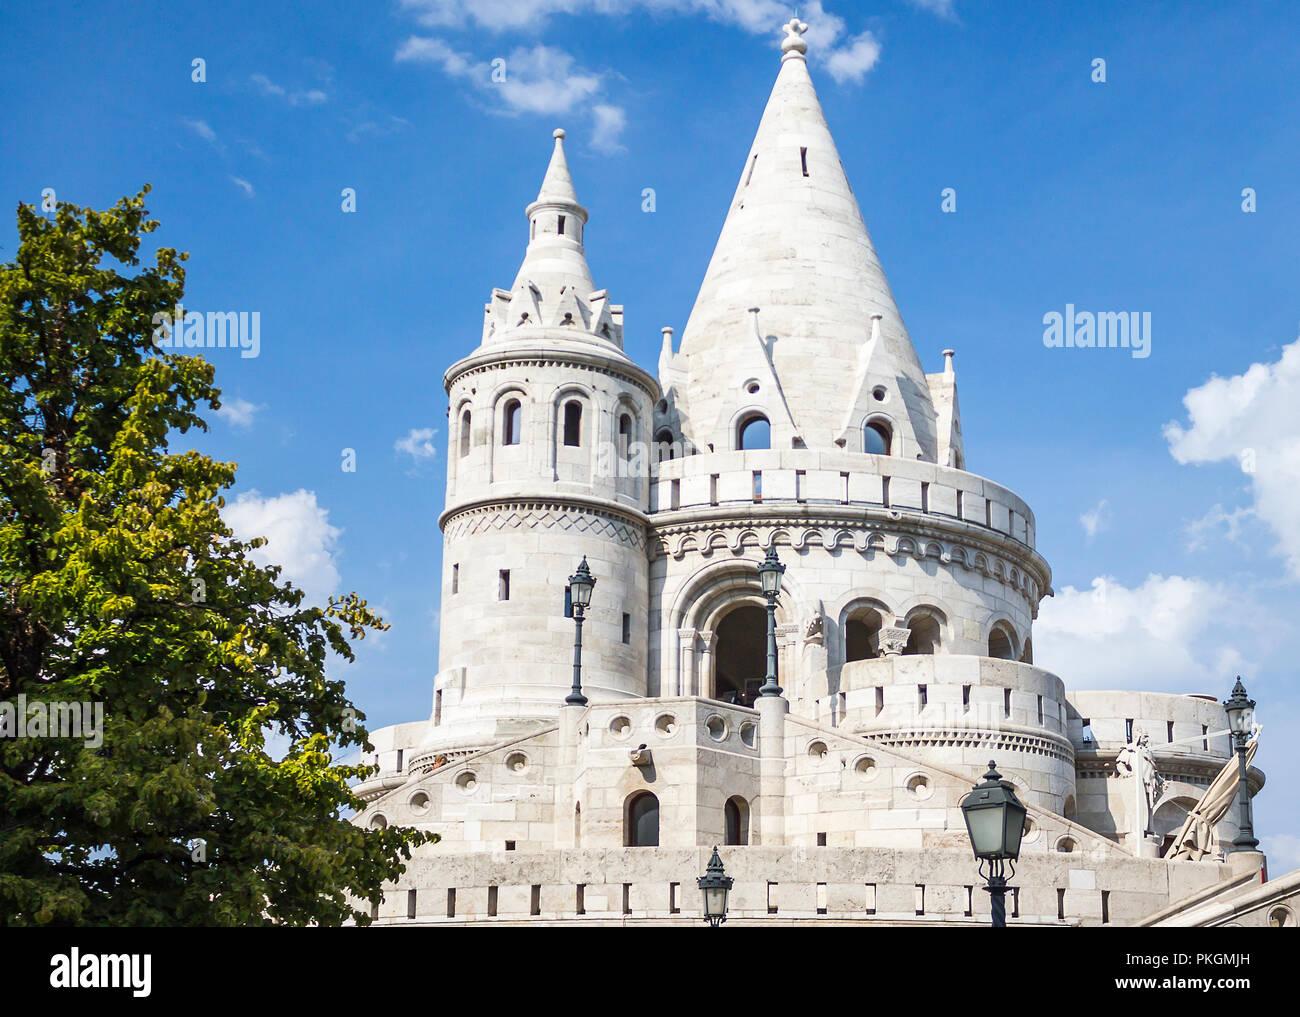 Tower of Fisherman's Bastion Close up. Budapest, Hungary. Stock Photo